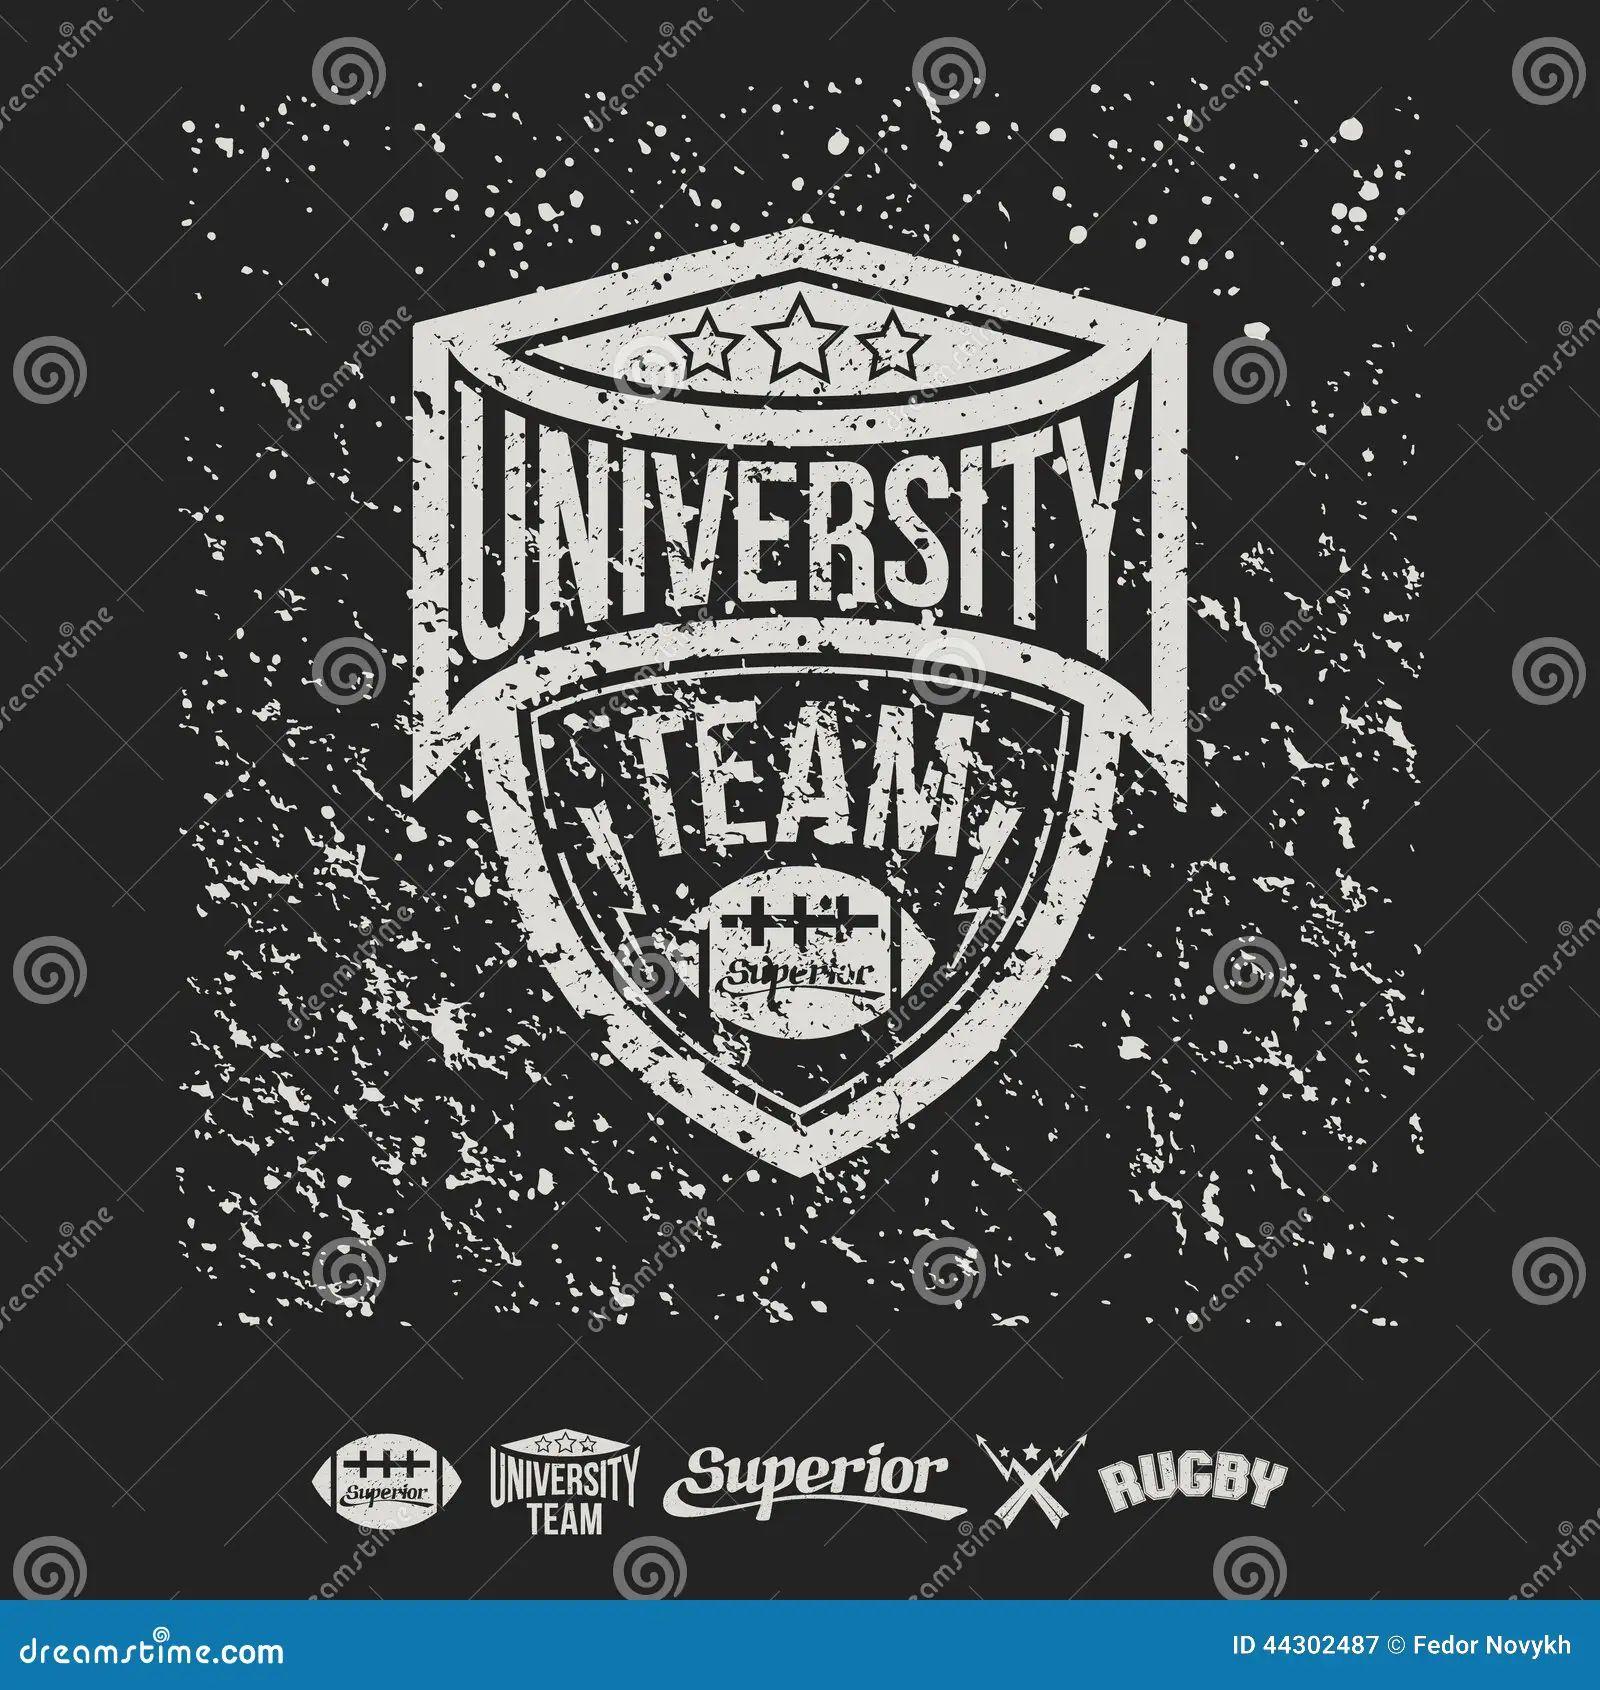 T shirt design 2 zeixs - T Shirt Team Rugby Emblem University Team And Design Elements Download